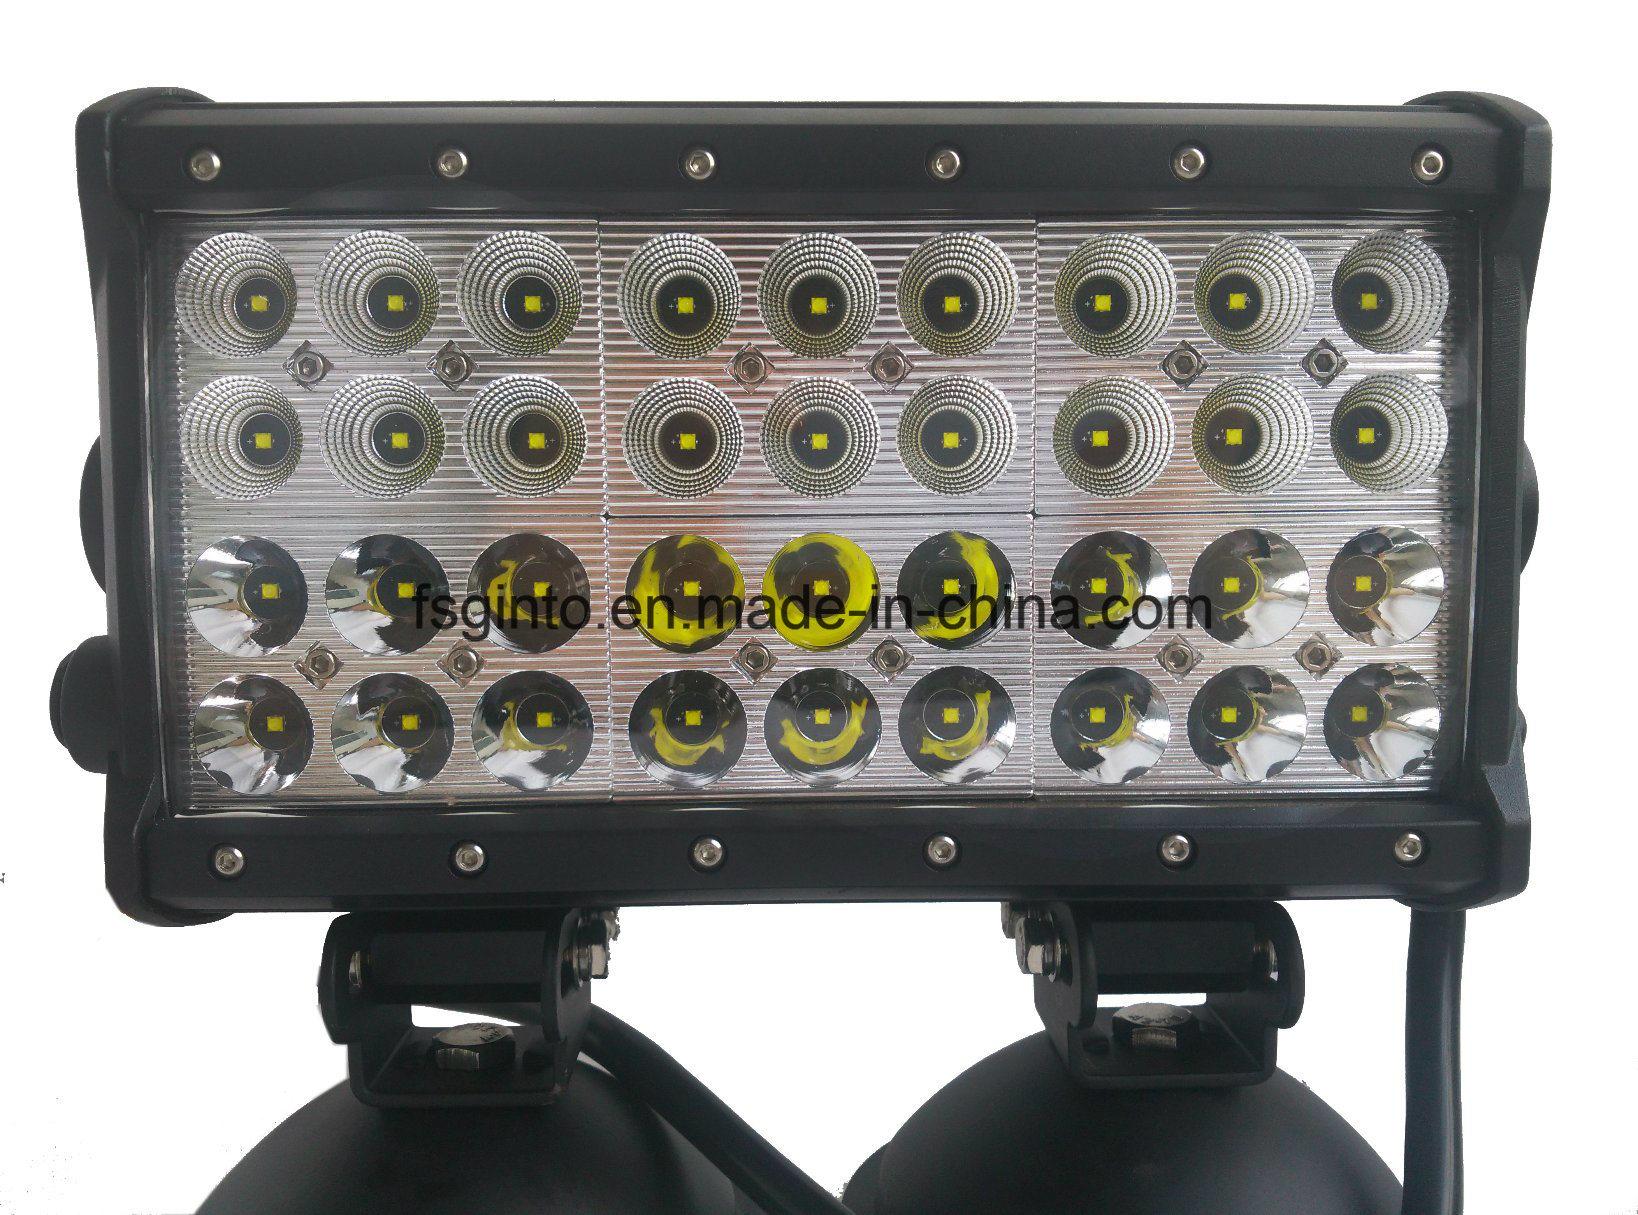 108W 10inch Offroad Quad Row CREE LED Work Light (GT3401-108W)